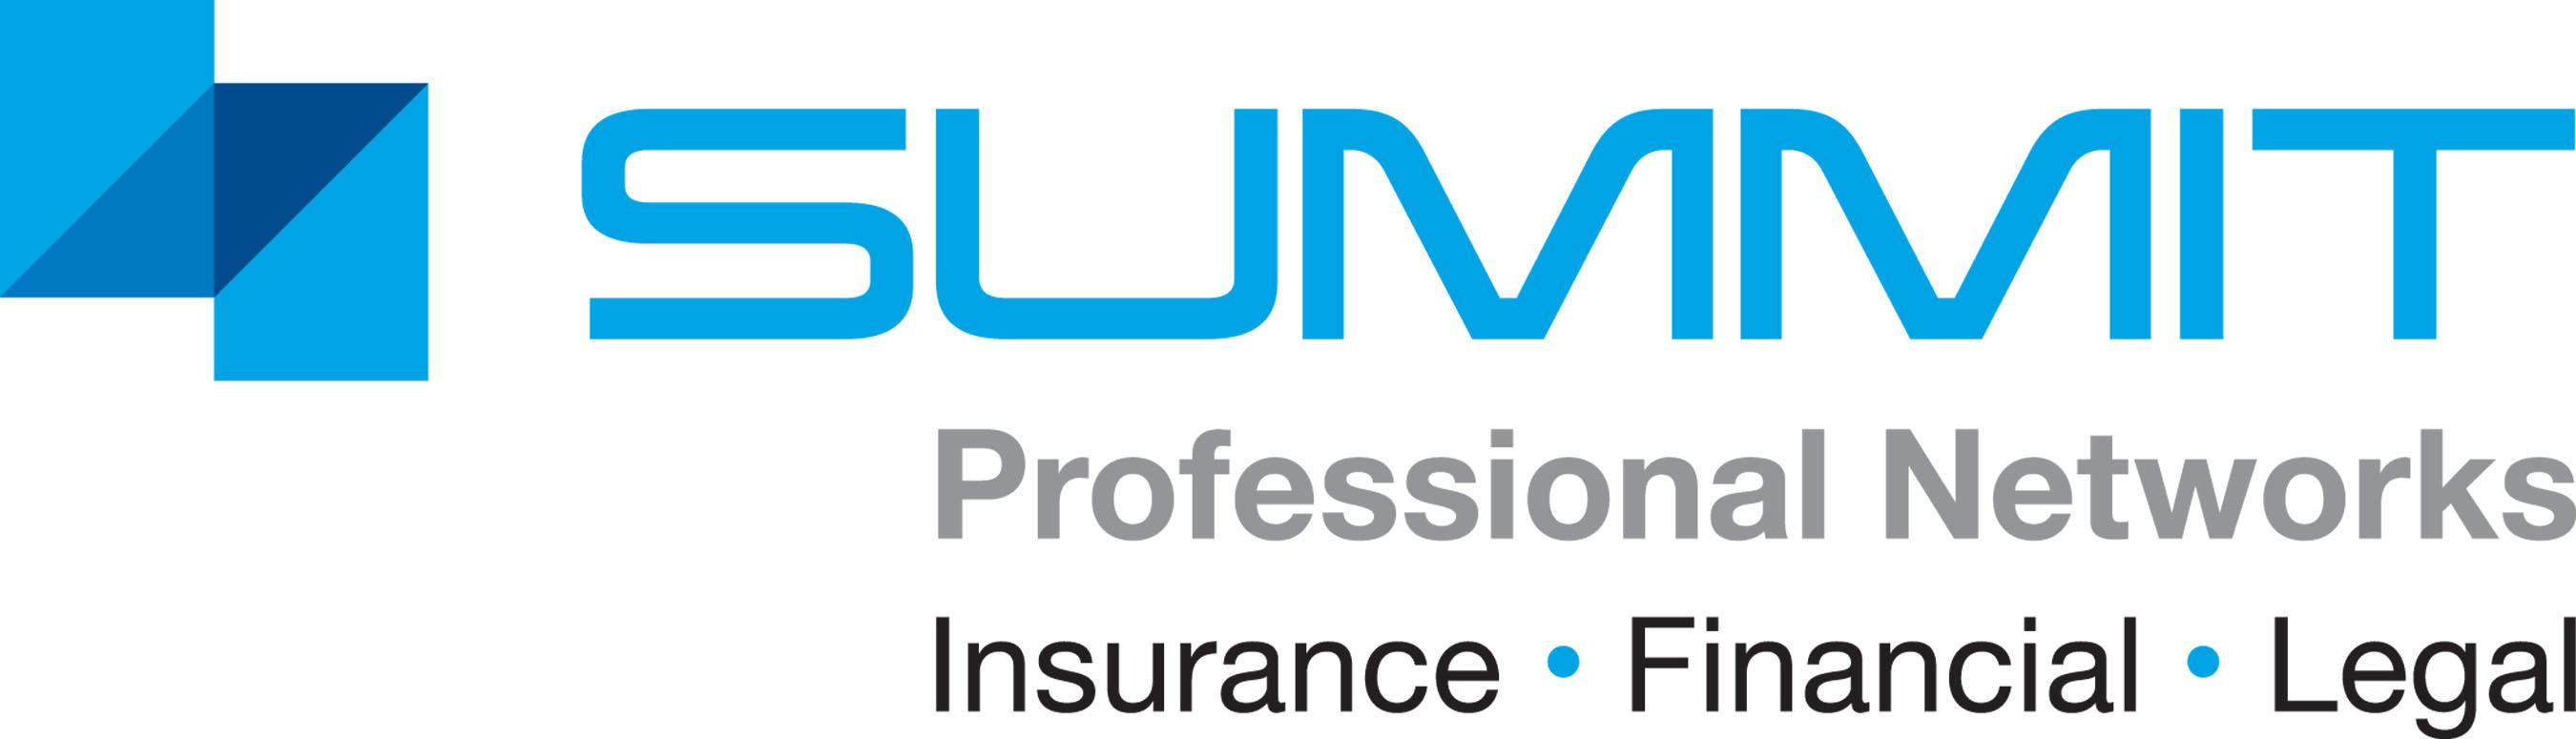 Summit Professional Networks logo.